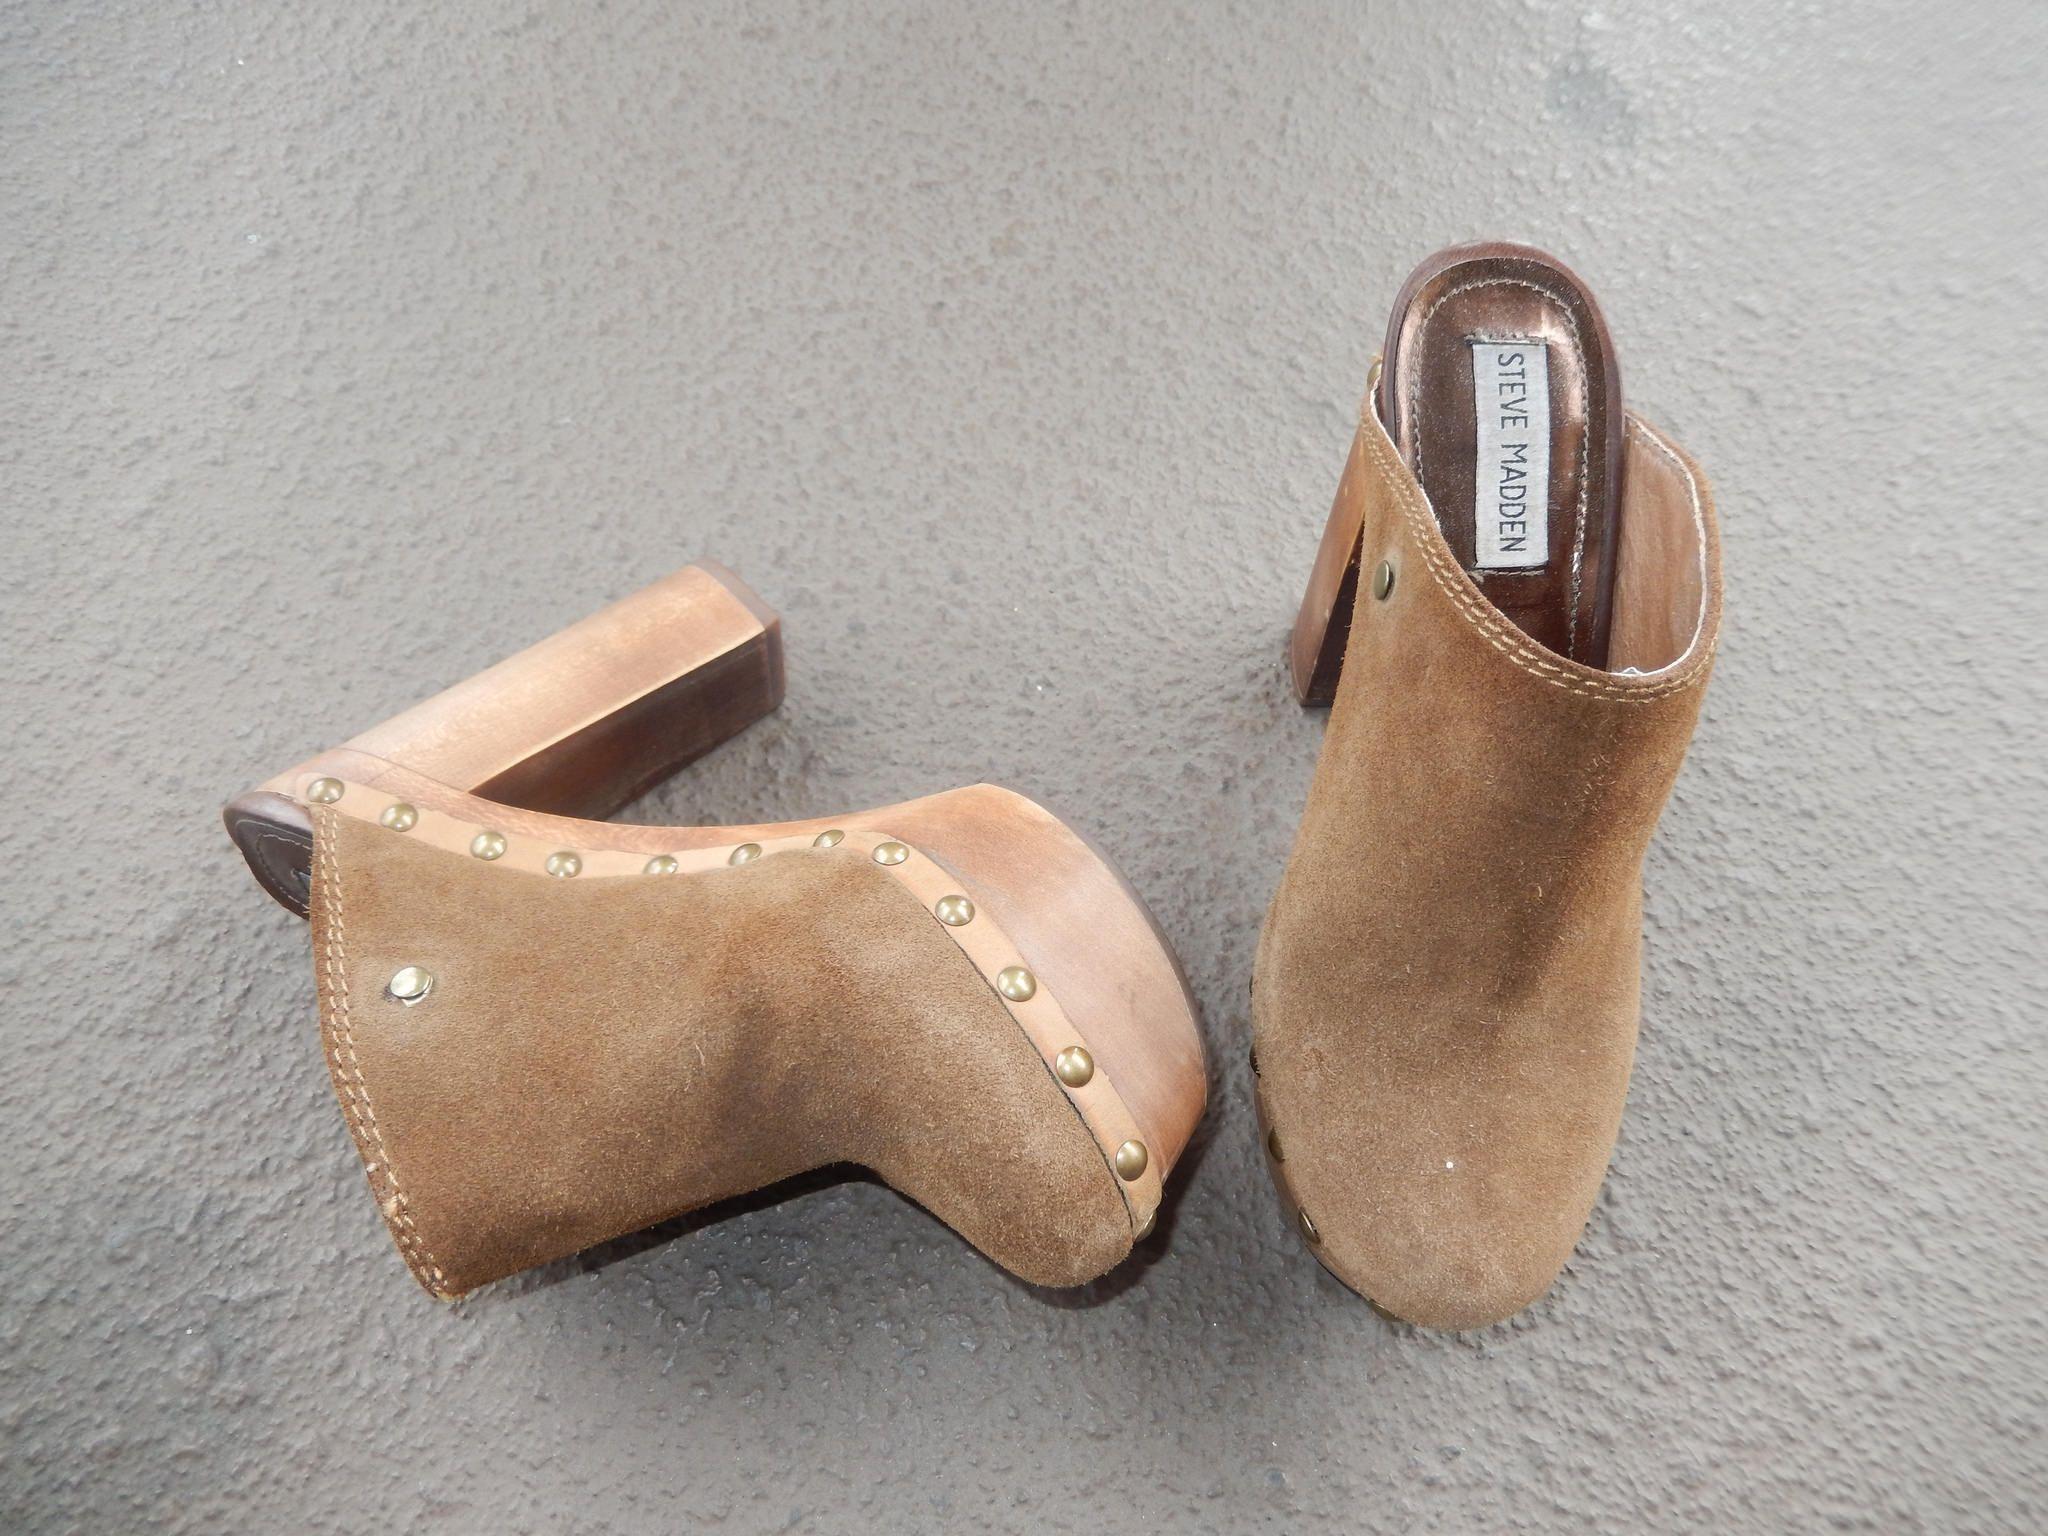 abajo curva camarera  Steve Madden Clogs | Heels, Clogs, Swedish clogs